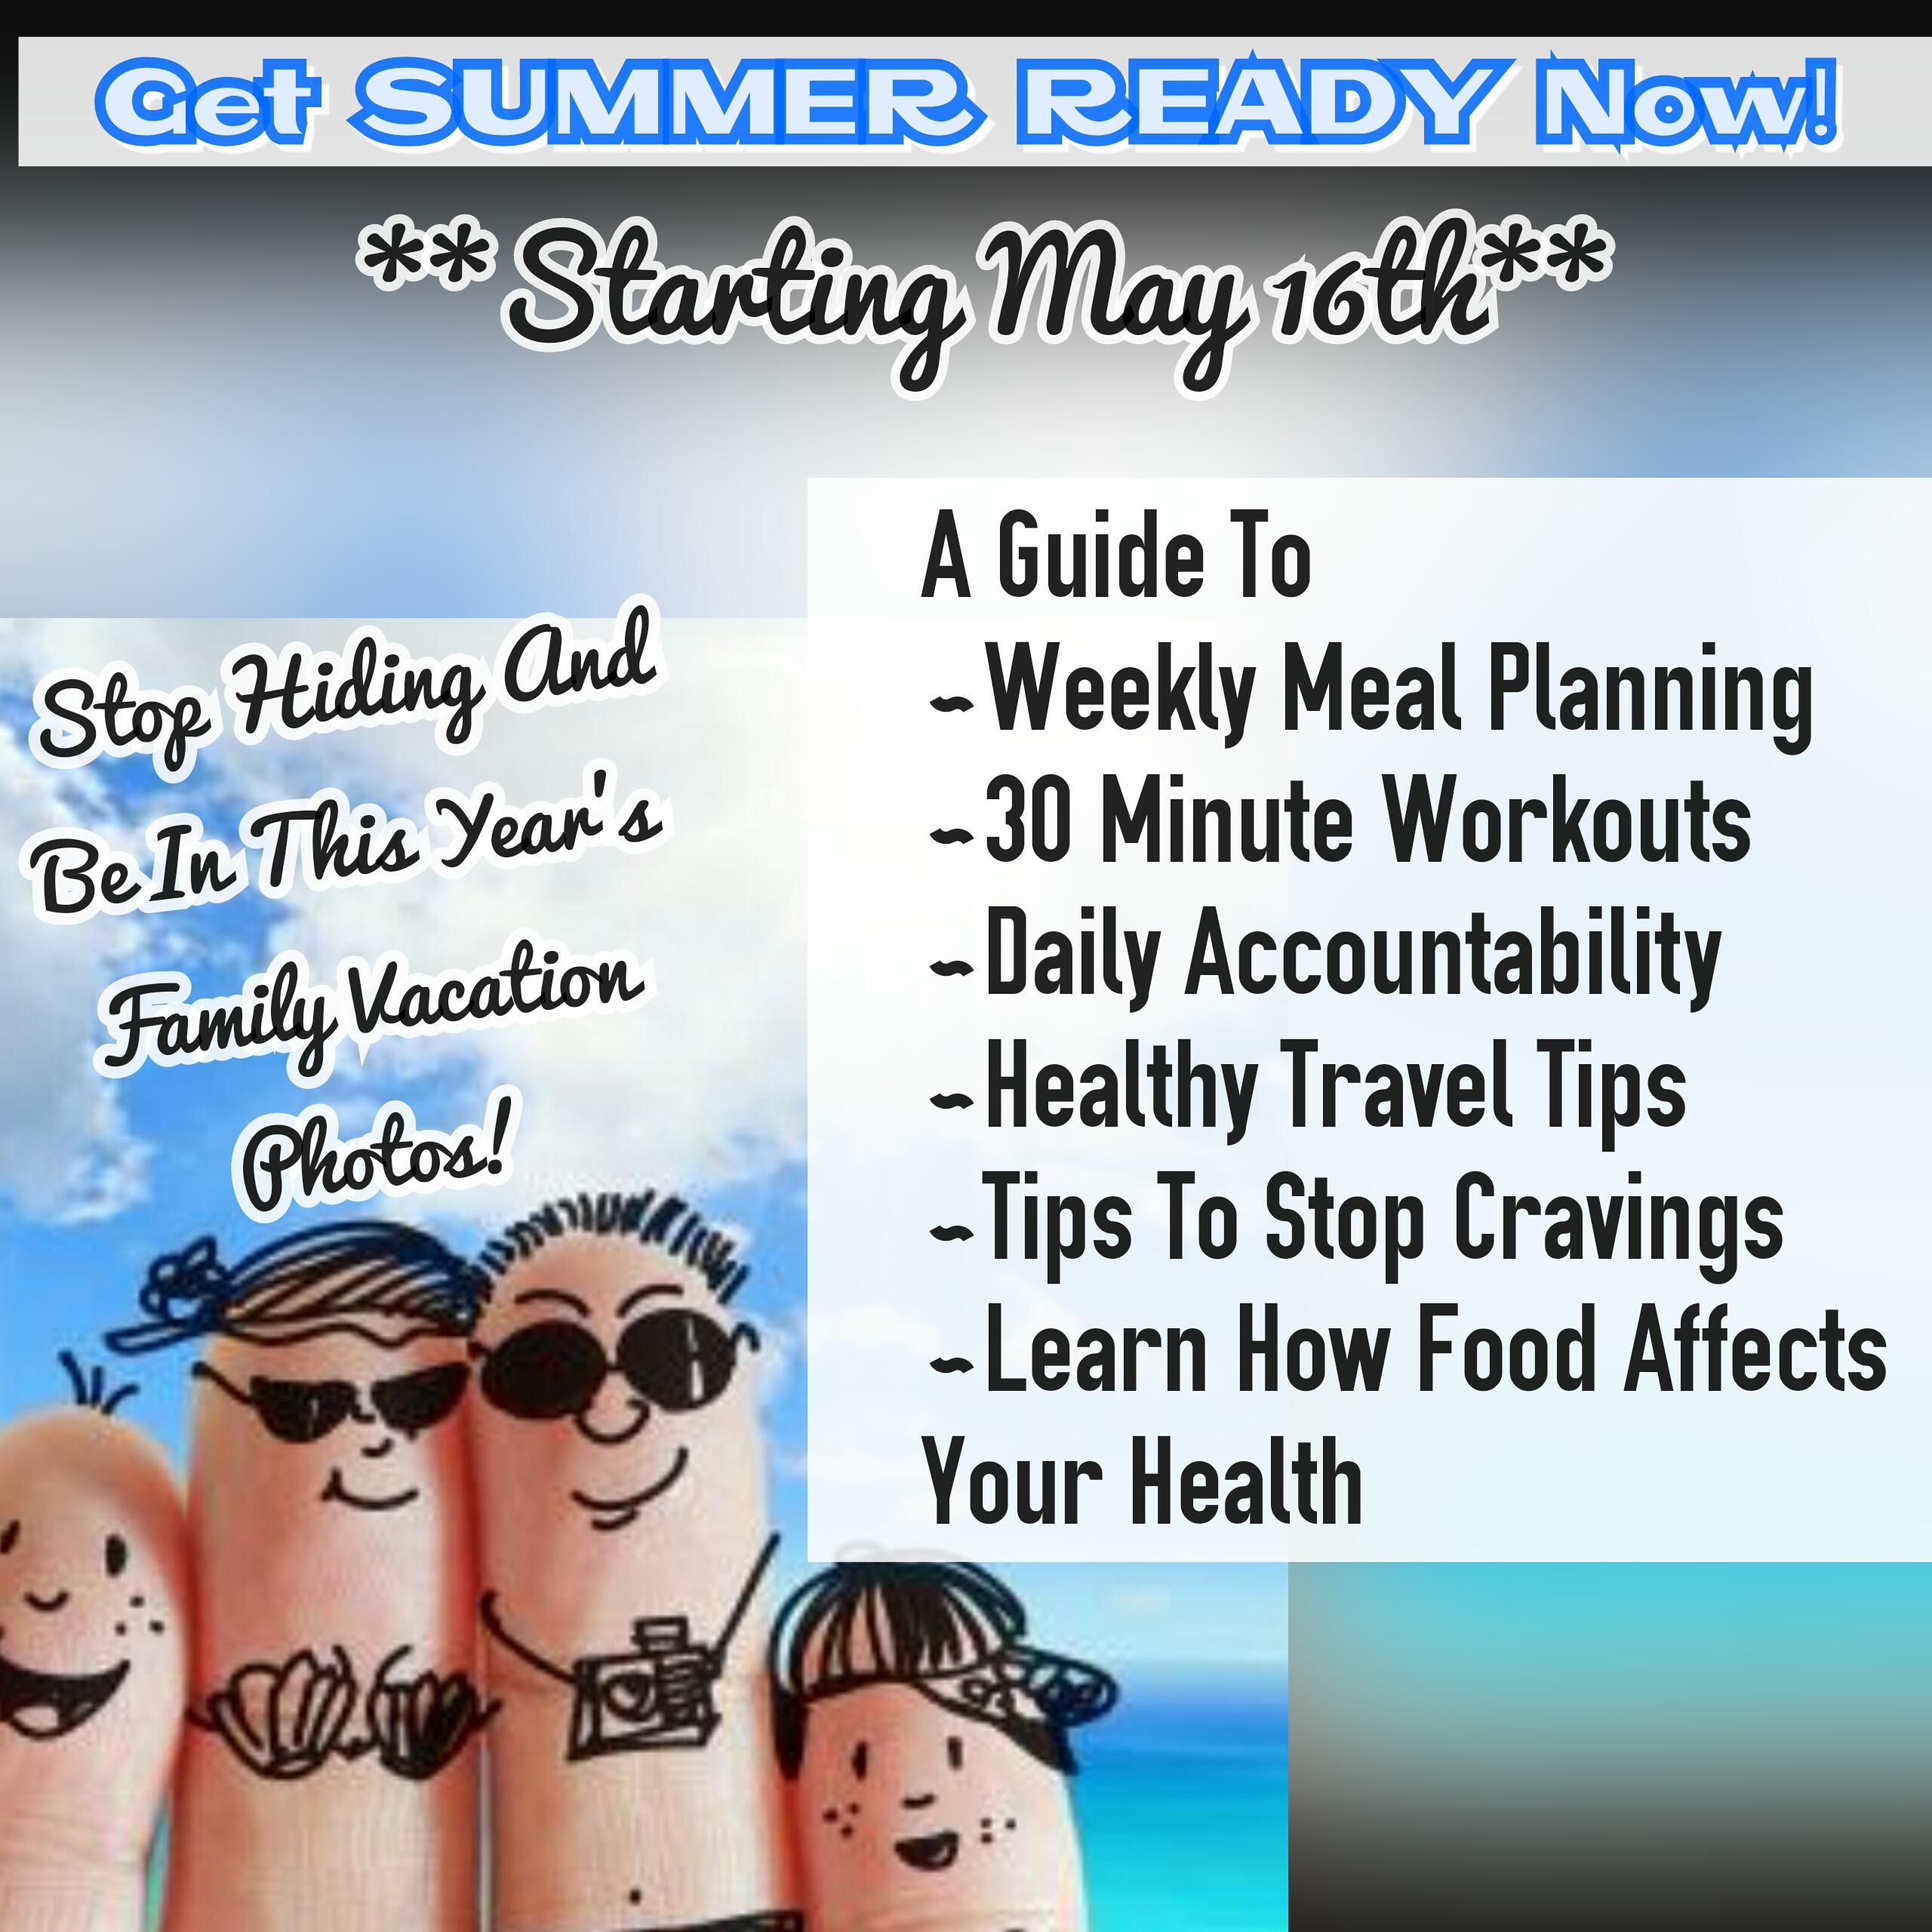 Get SUMMER READY